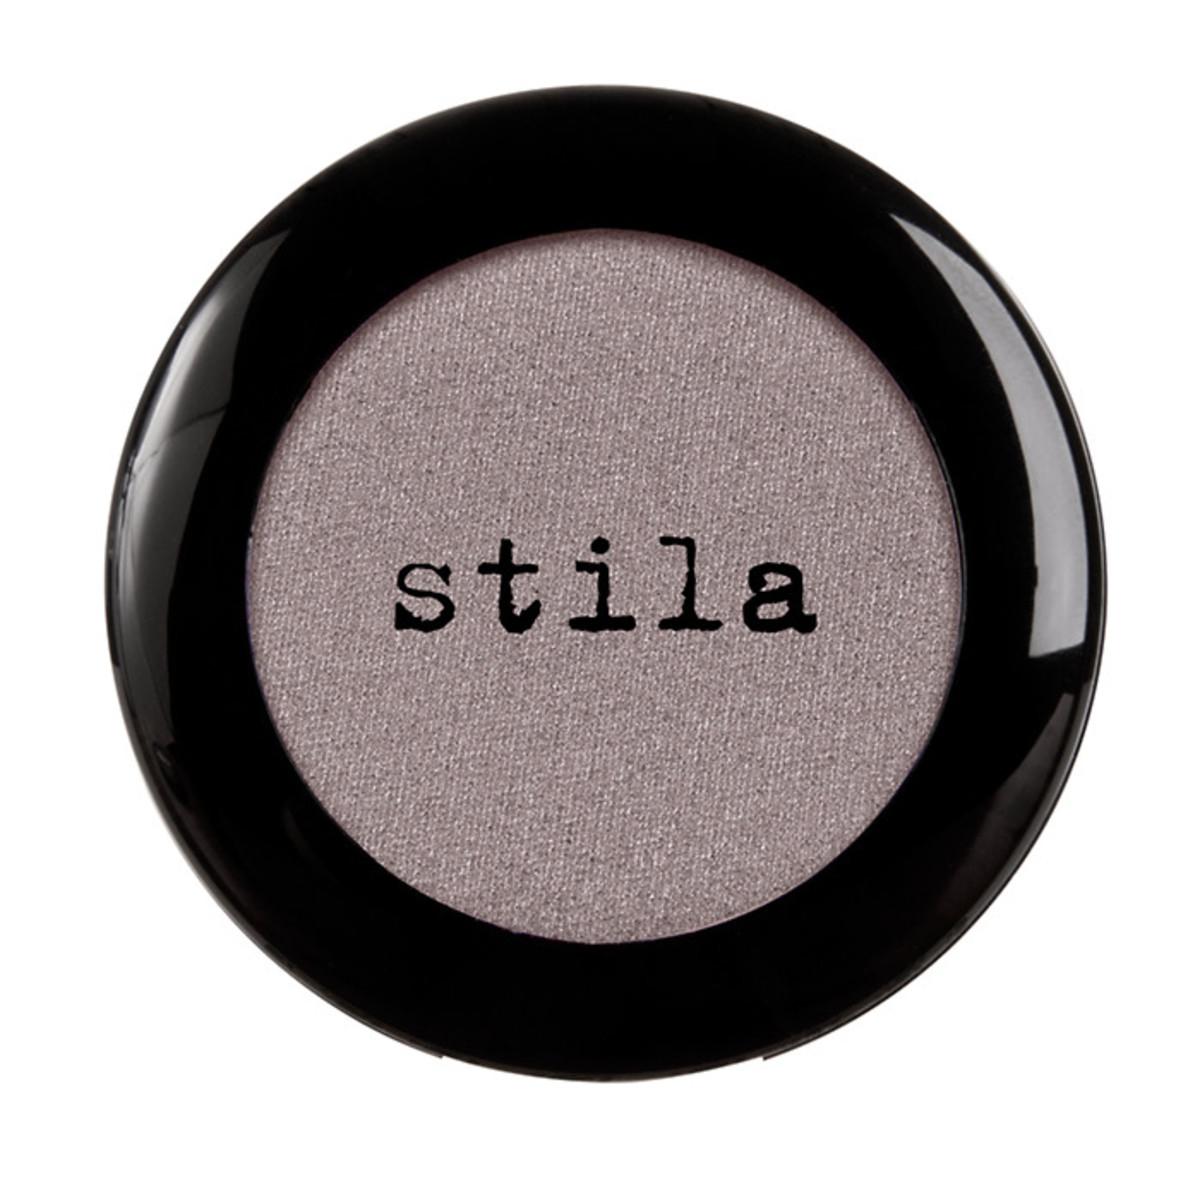 Stila Eye Shadow in Diamond Lil